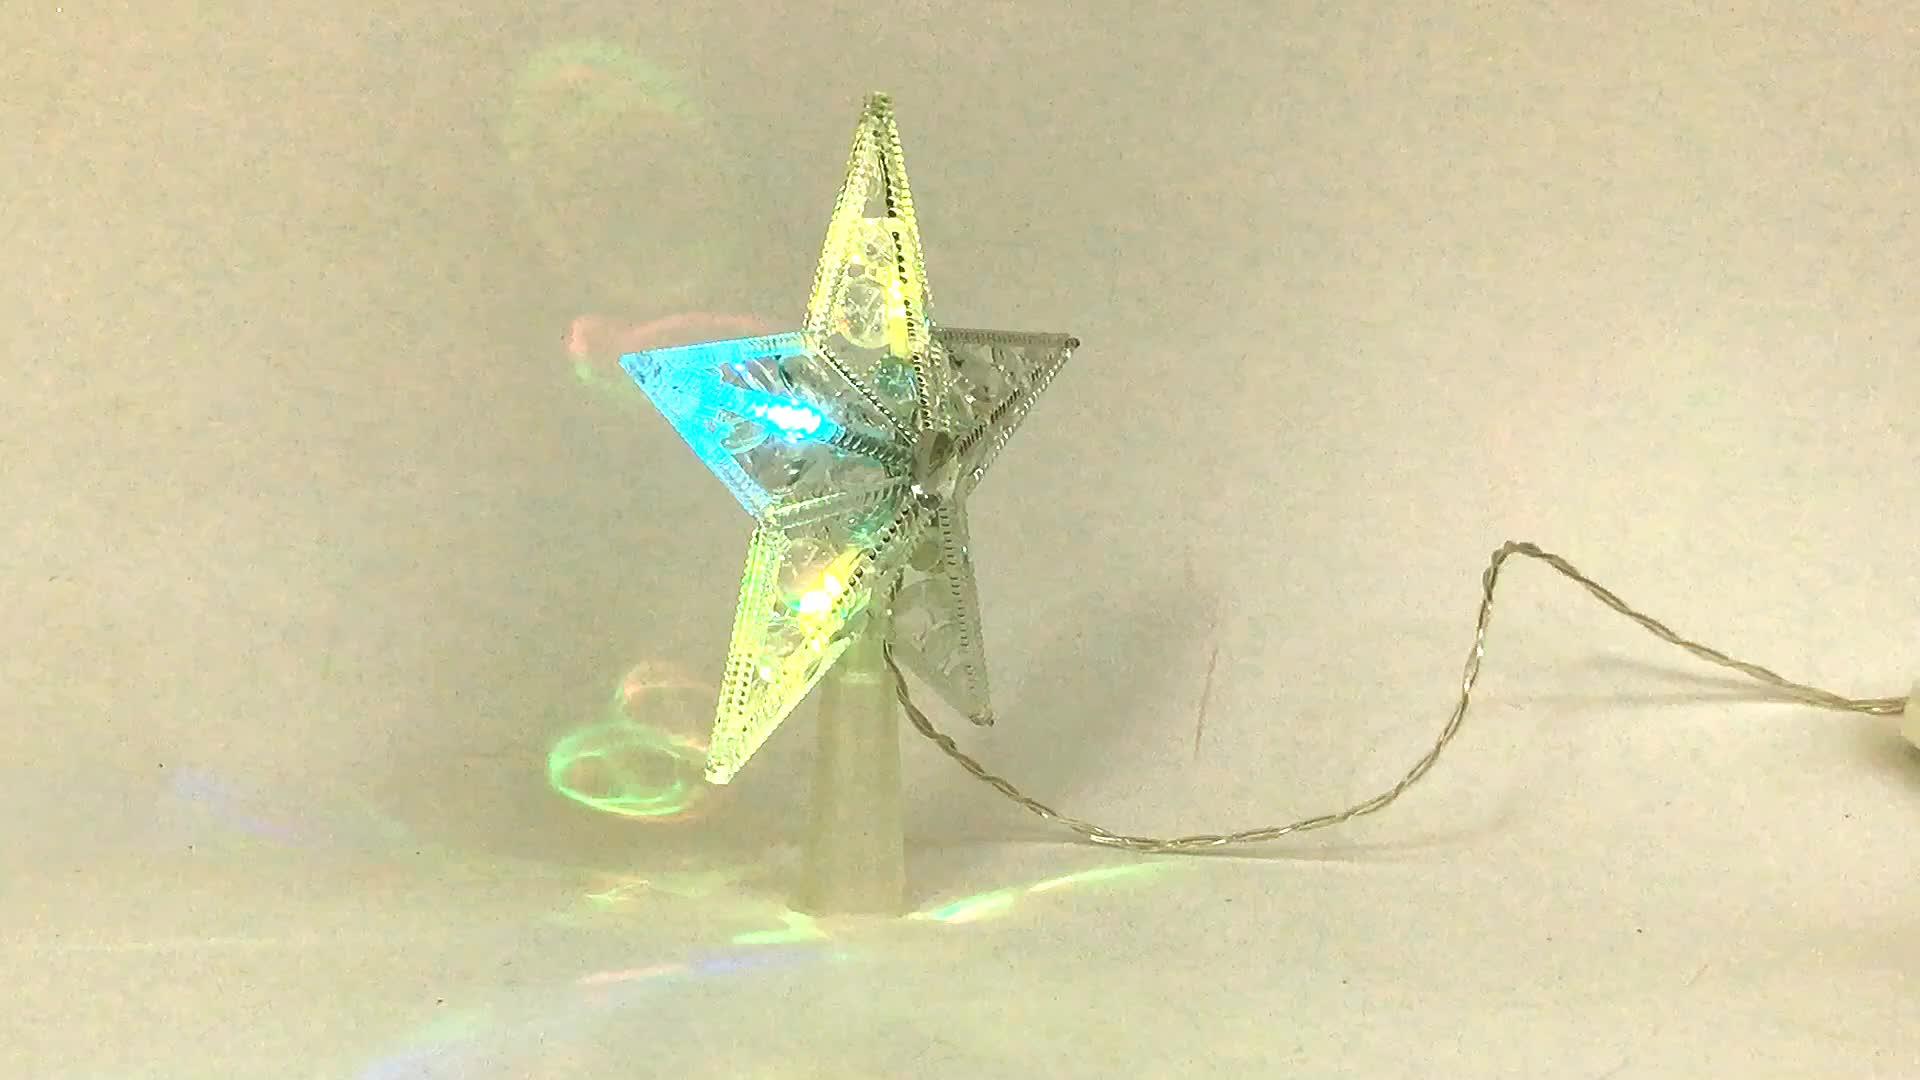 Kerst Decoratieve 5.5in Rgb Kleur Veranderende Led Ster Boom Top